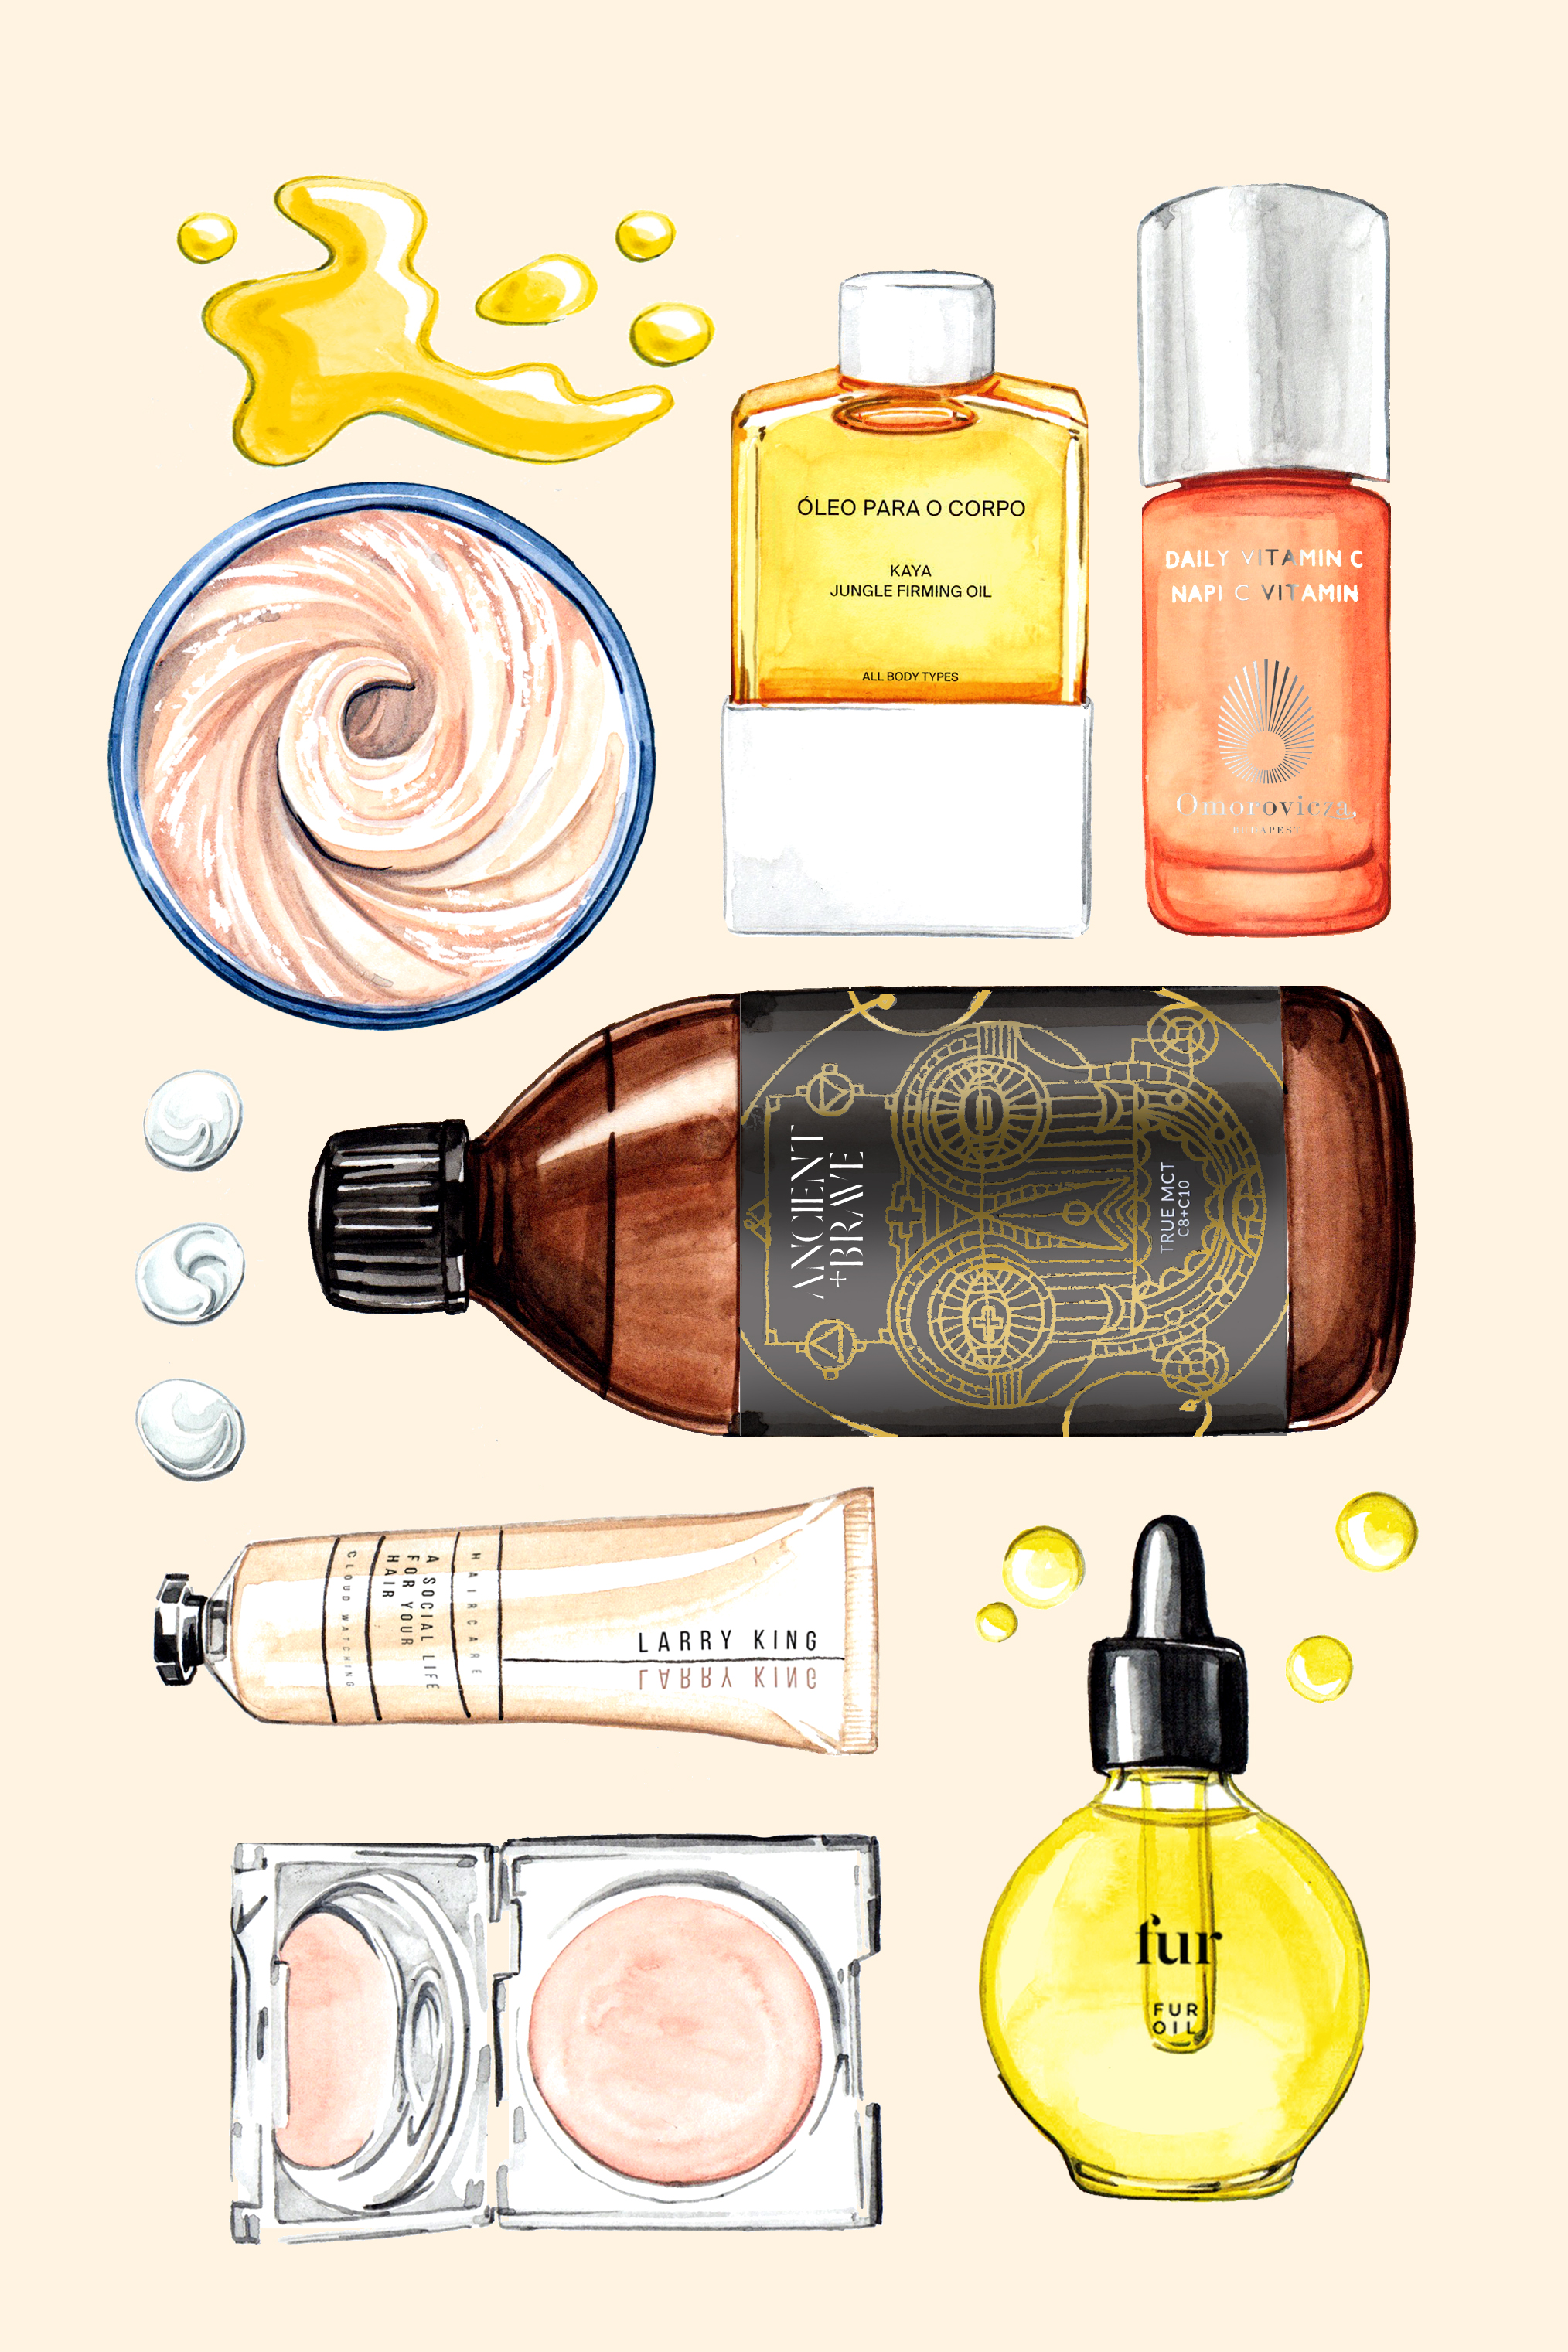 Willa Gebbie watercolour beauty illustrations for Porter magazine